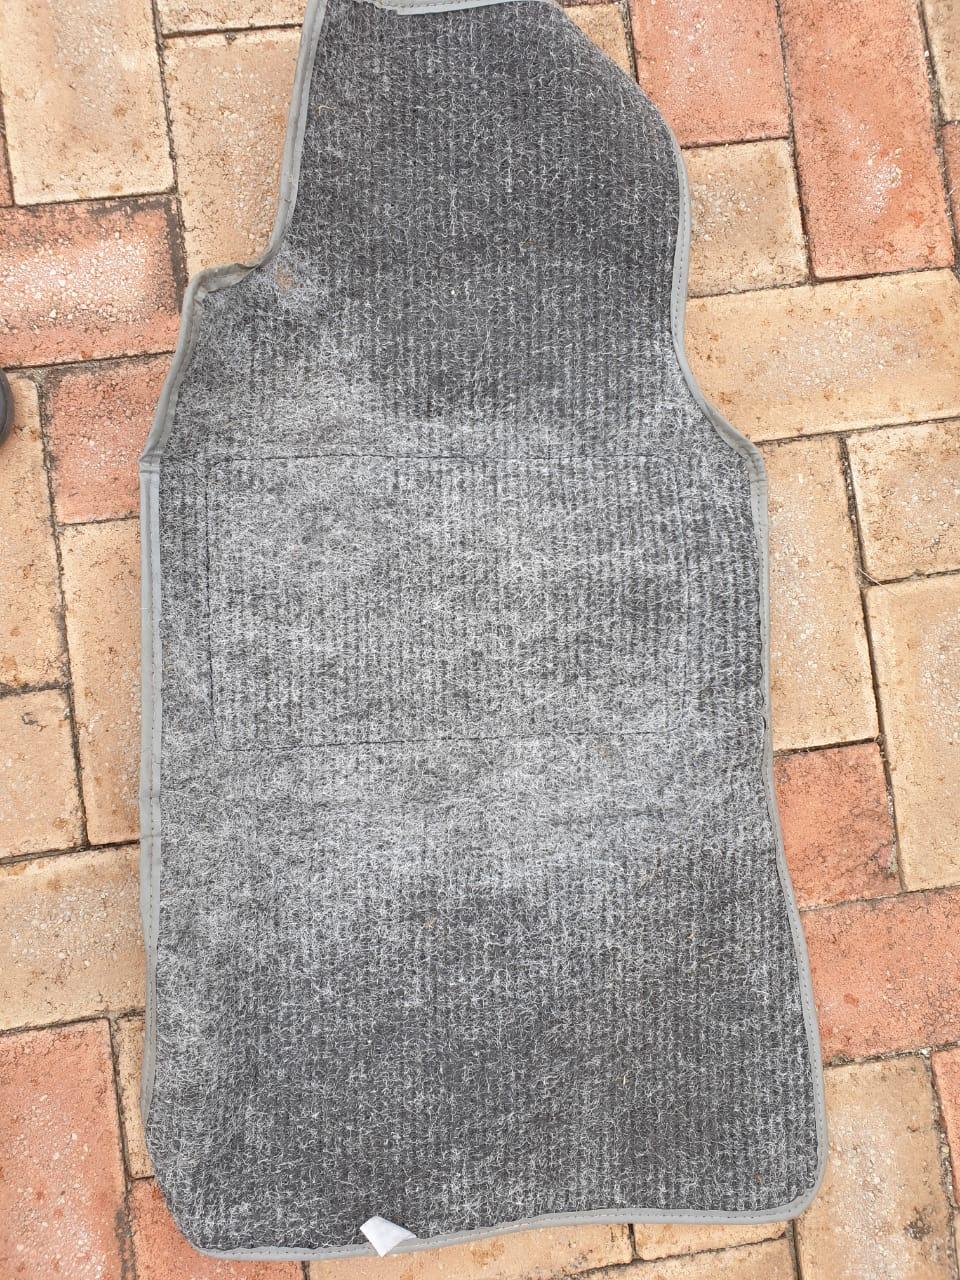 car mats for sale